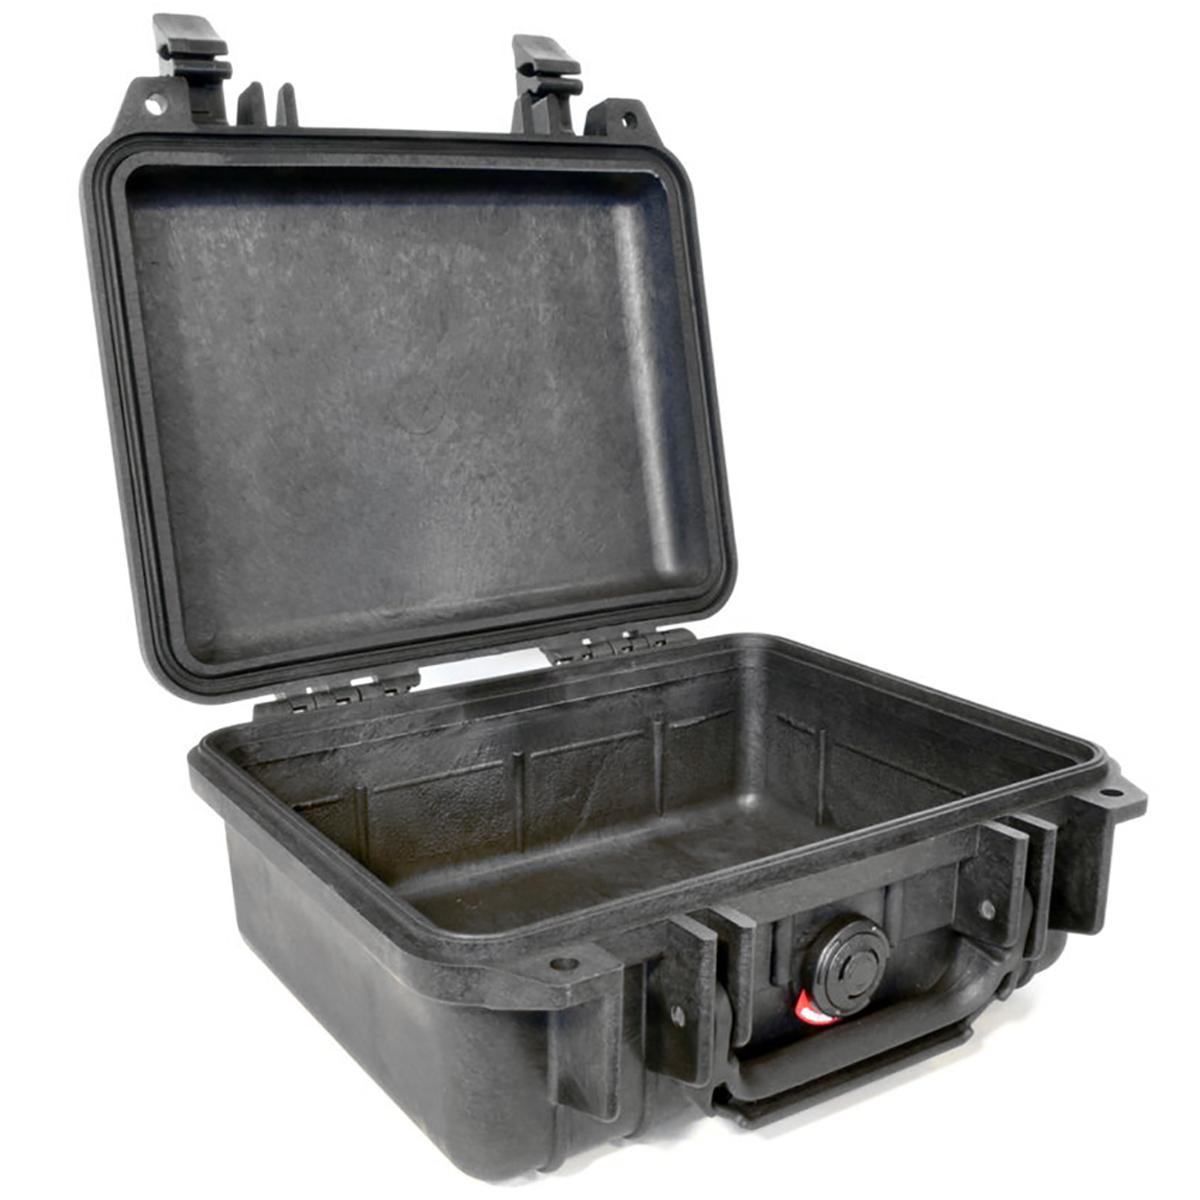 Peli Case 1200 Zwart-Leeg